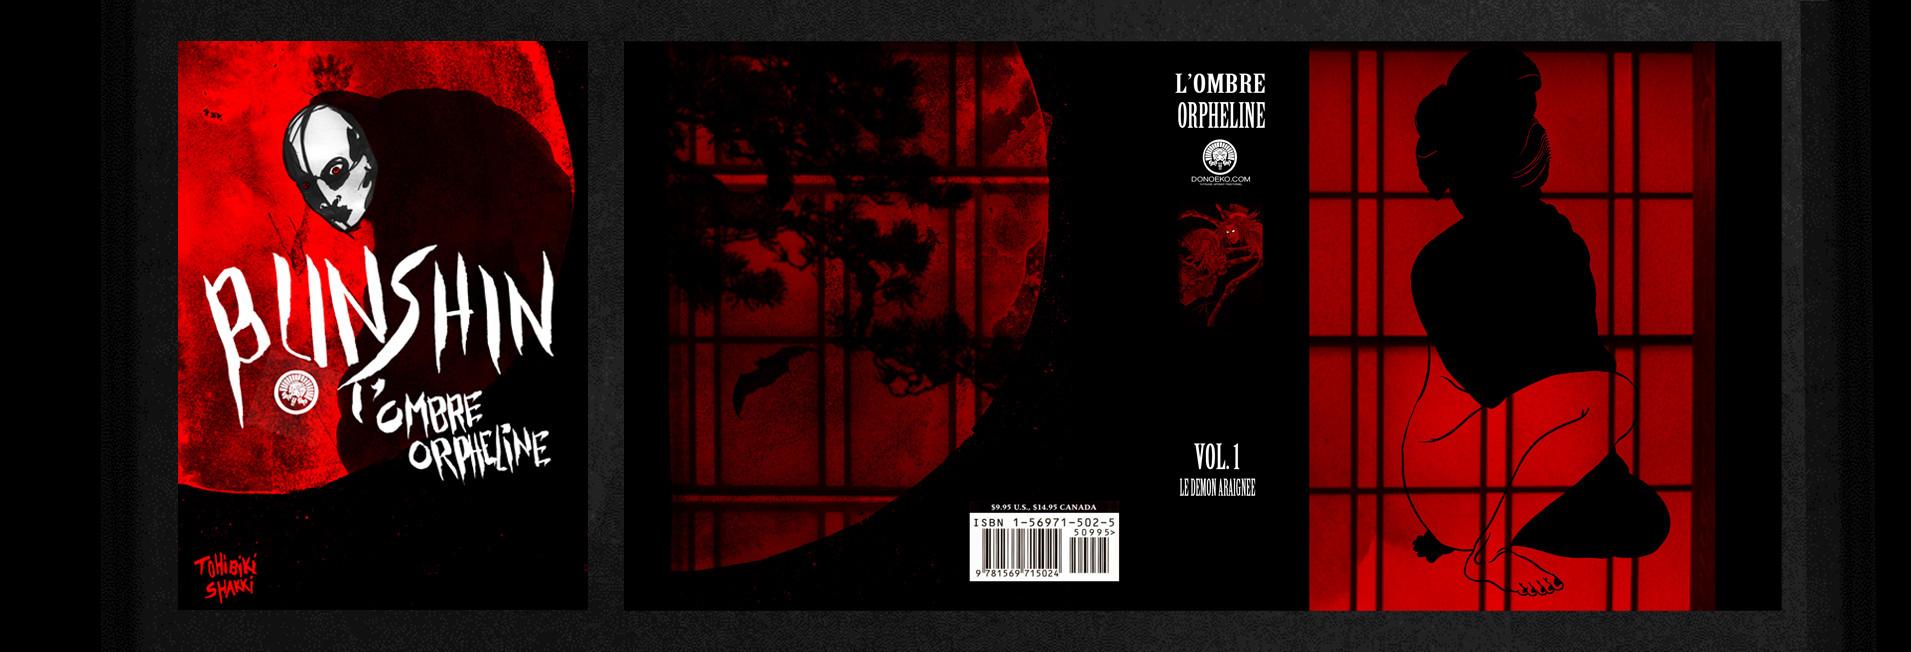 01 ENTREE COVER COUVERTURE BD BUNSHIN OM